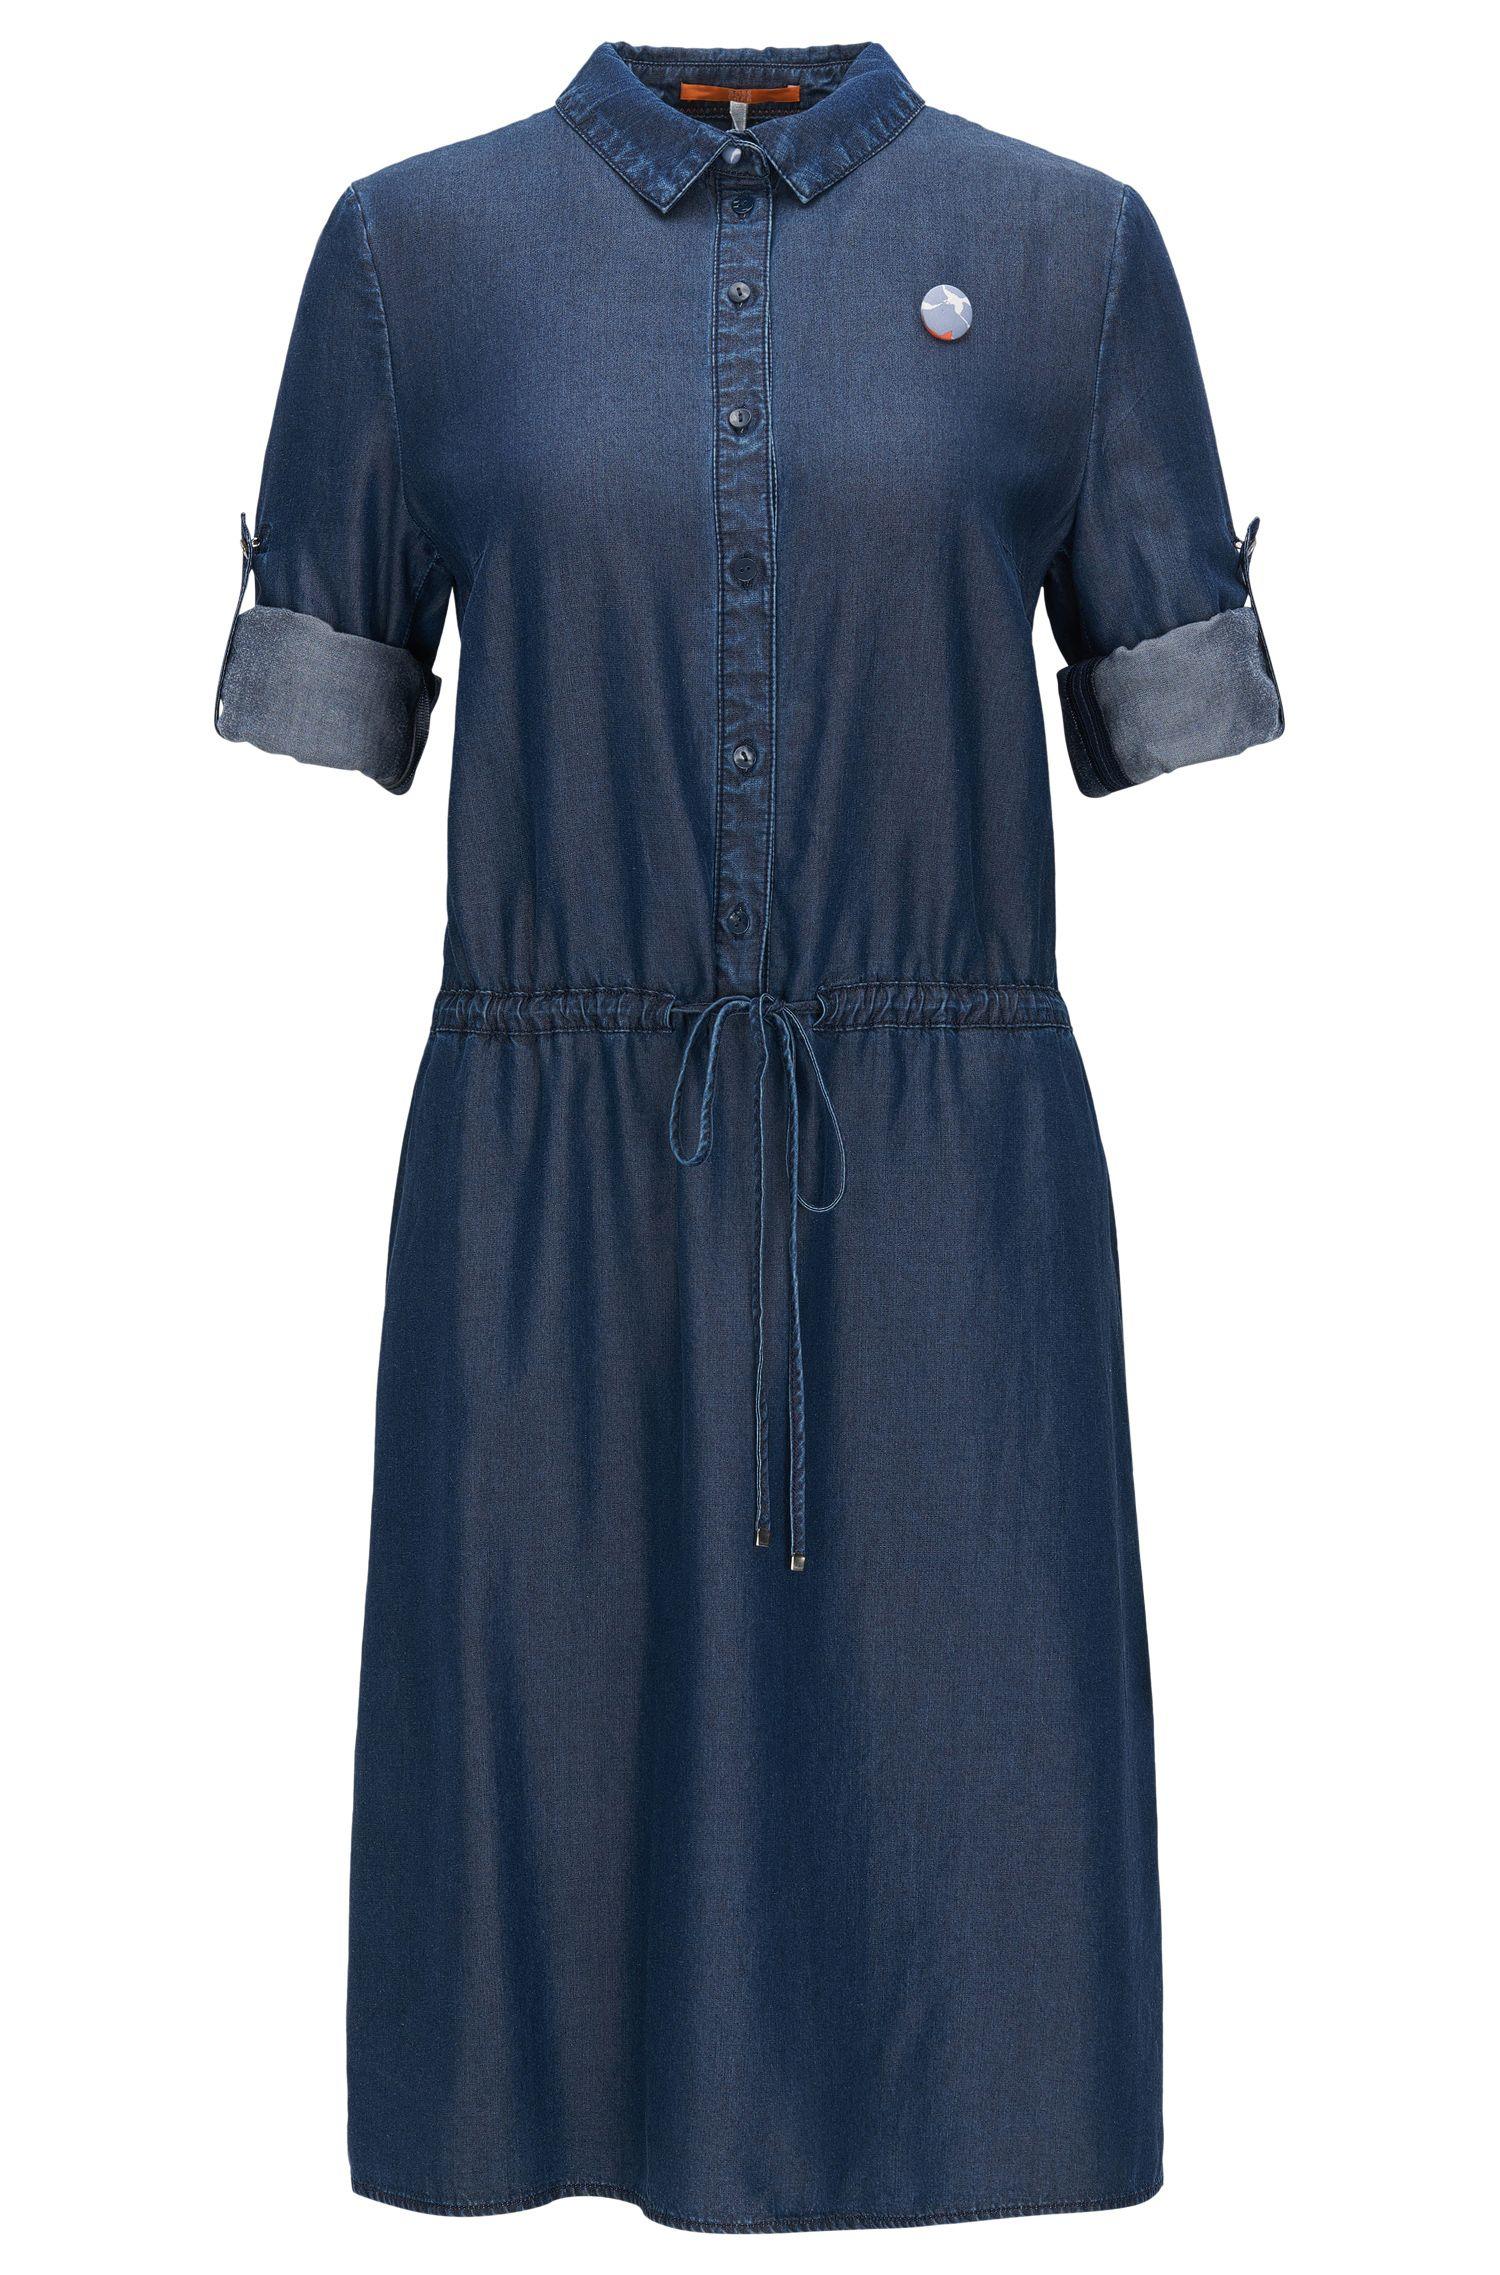 Shirt dress in washed denim